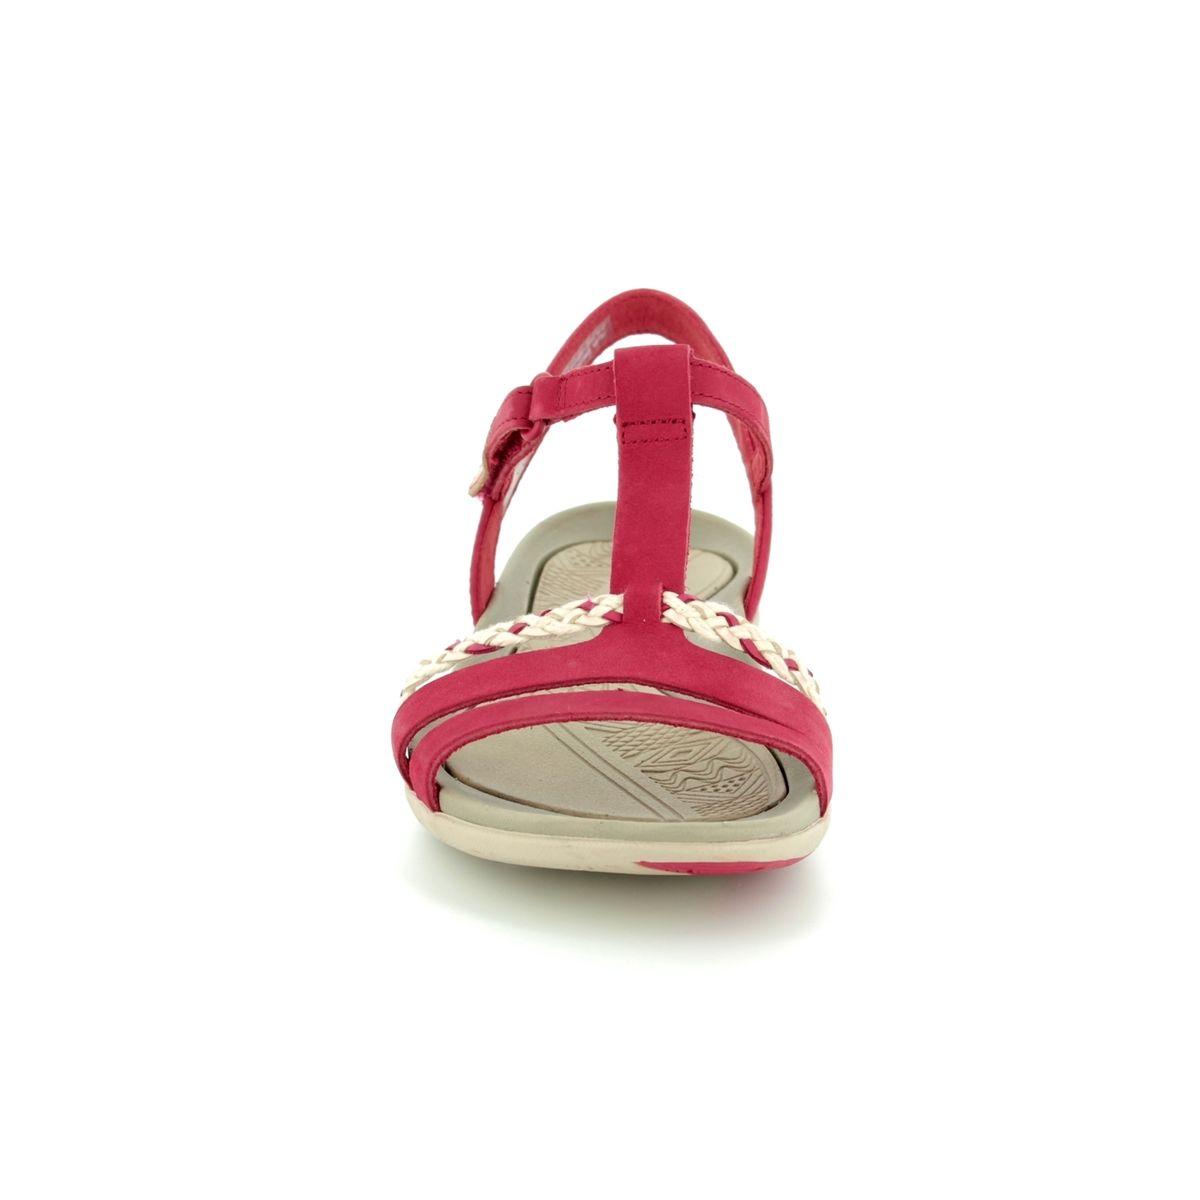 f25399d815e Clarks Sandals - Red - 2389 24D TEALITE GRACE